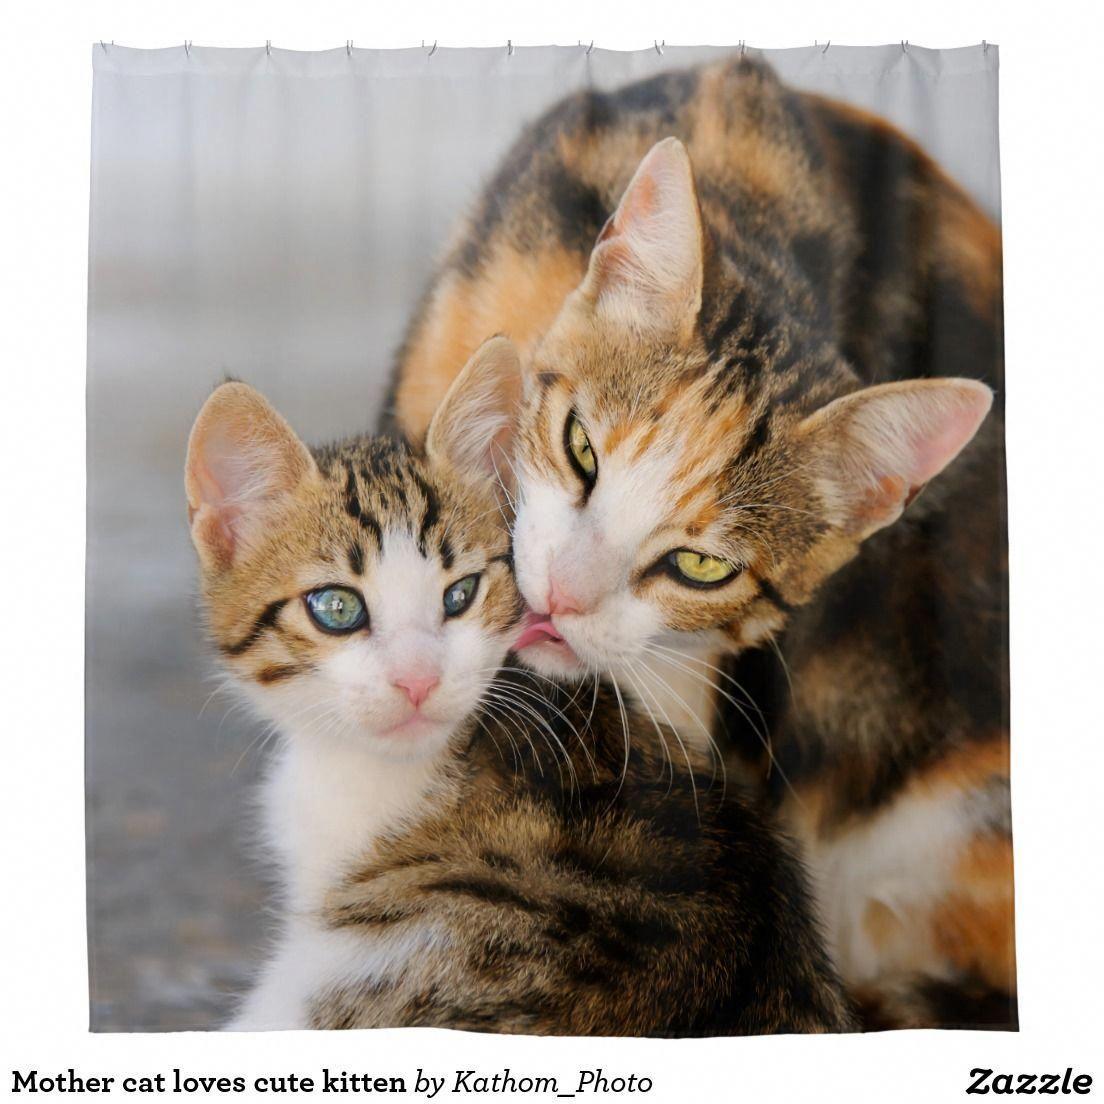 Mother Cat Loves Cute Kitten Felineleukemia Kittens Cutest Kittens Cutest Baby Mother Cat